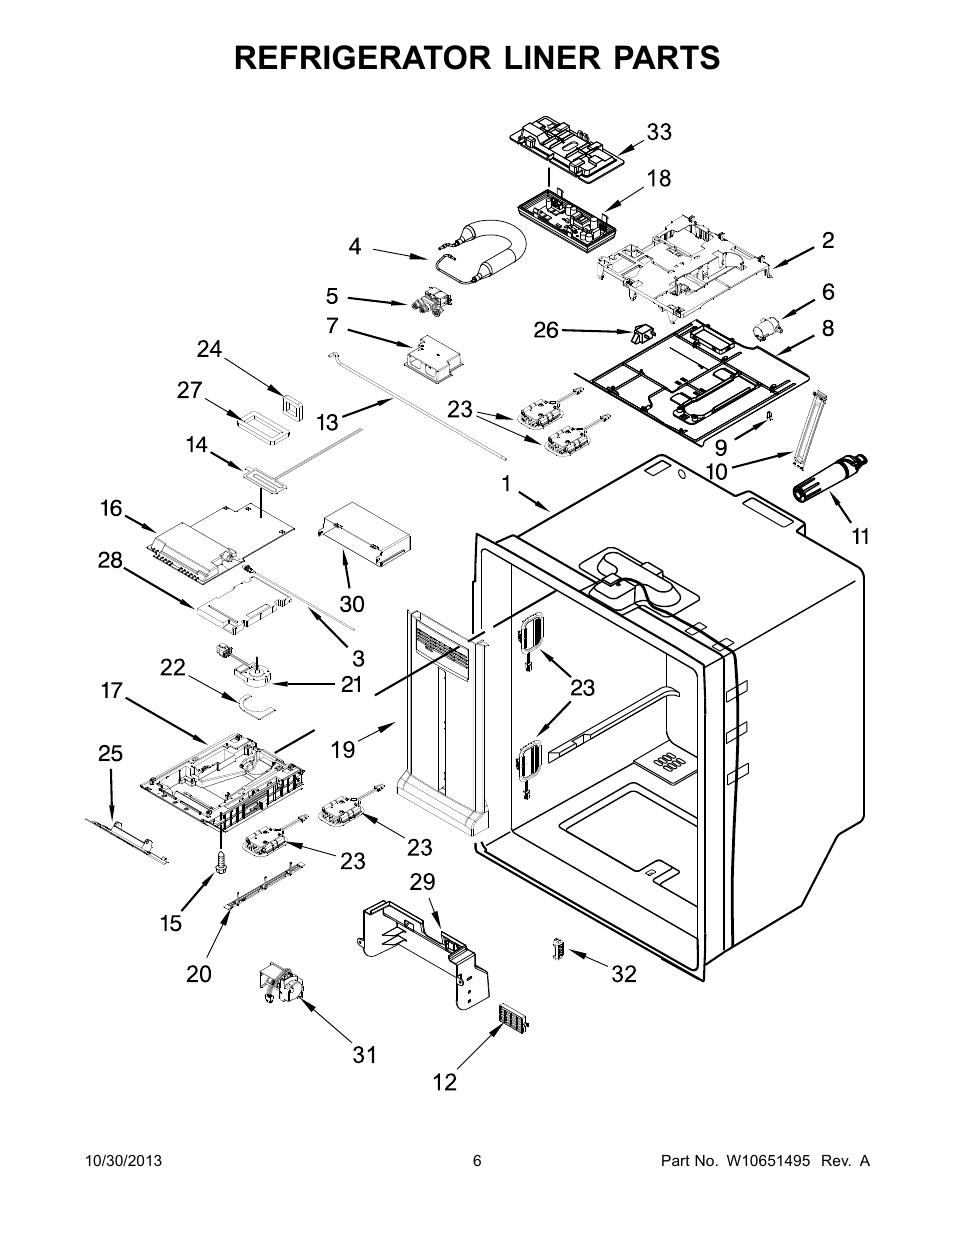 Maytag Refrigerator Instruction Manual